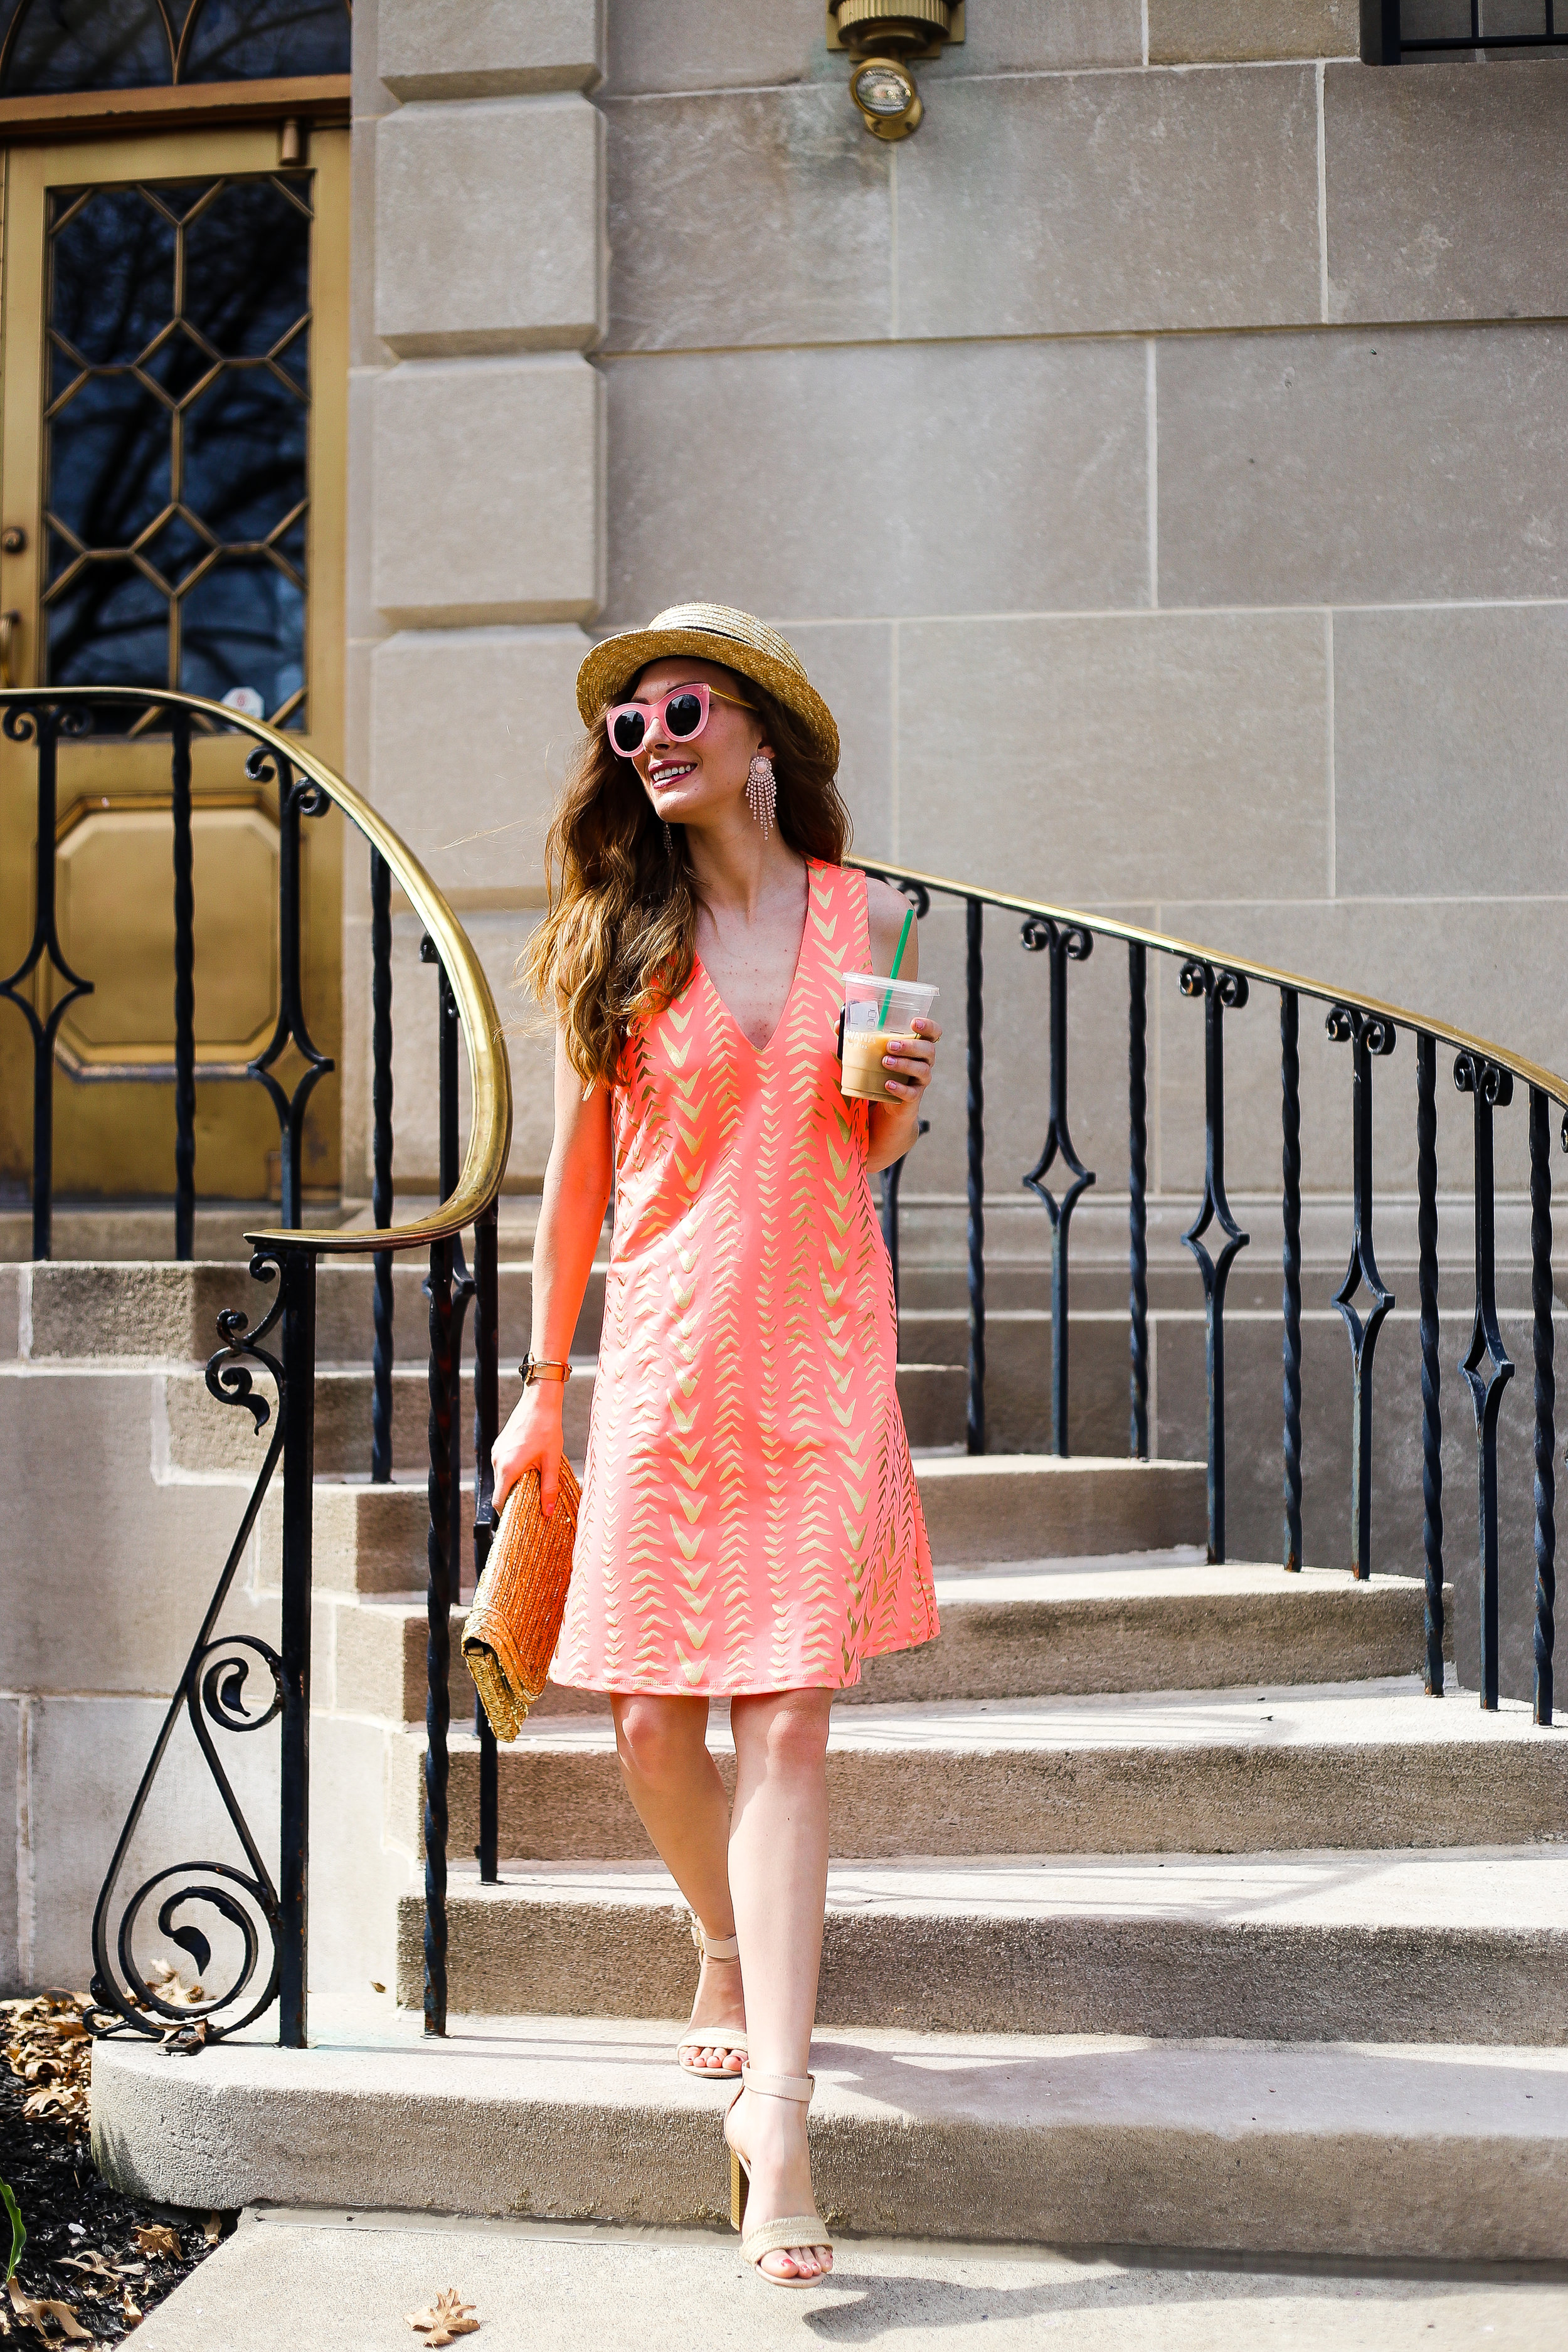 Sunny Days Ahead // Neon Metallic Dress- Enchanting Elegance